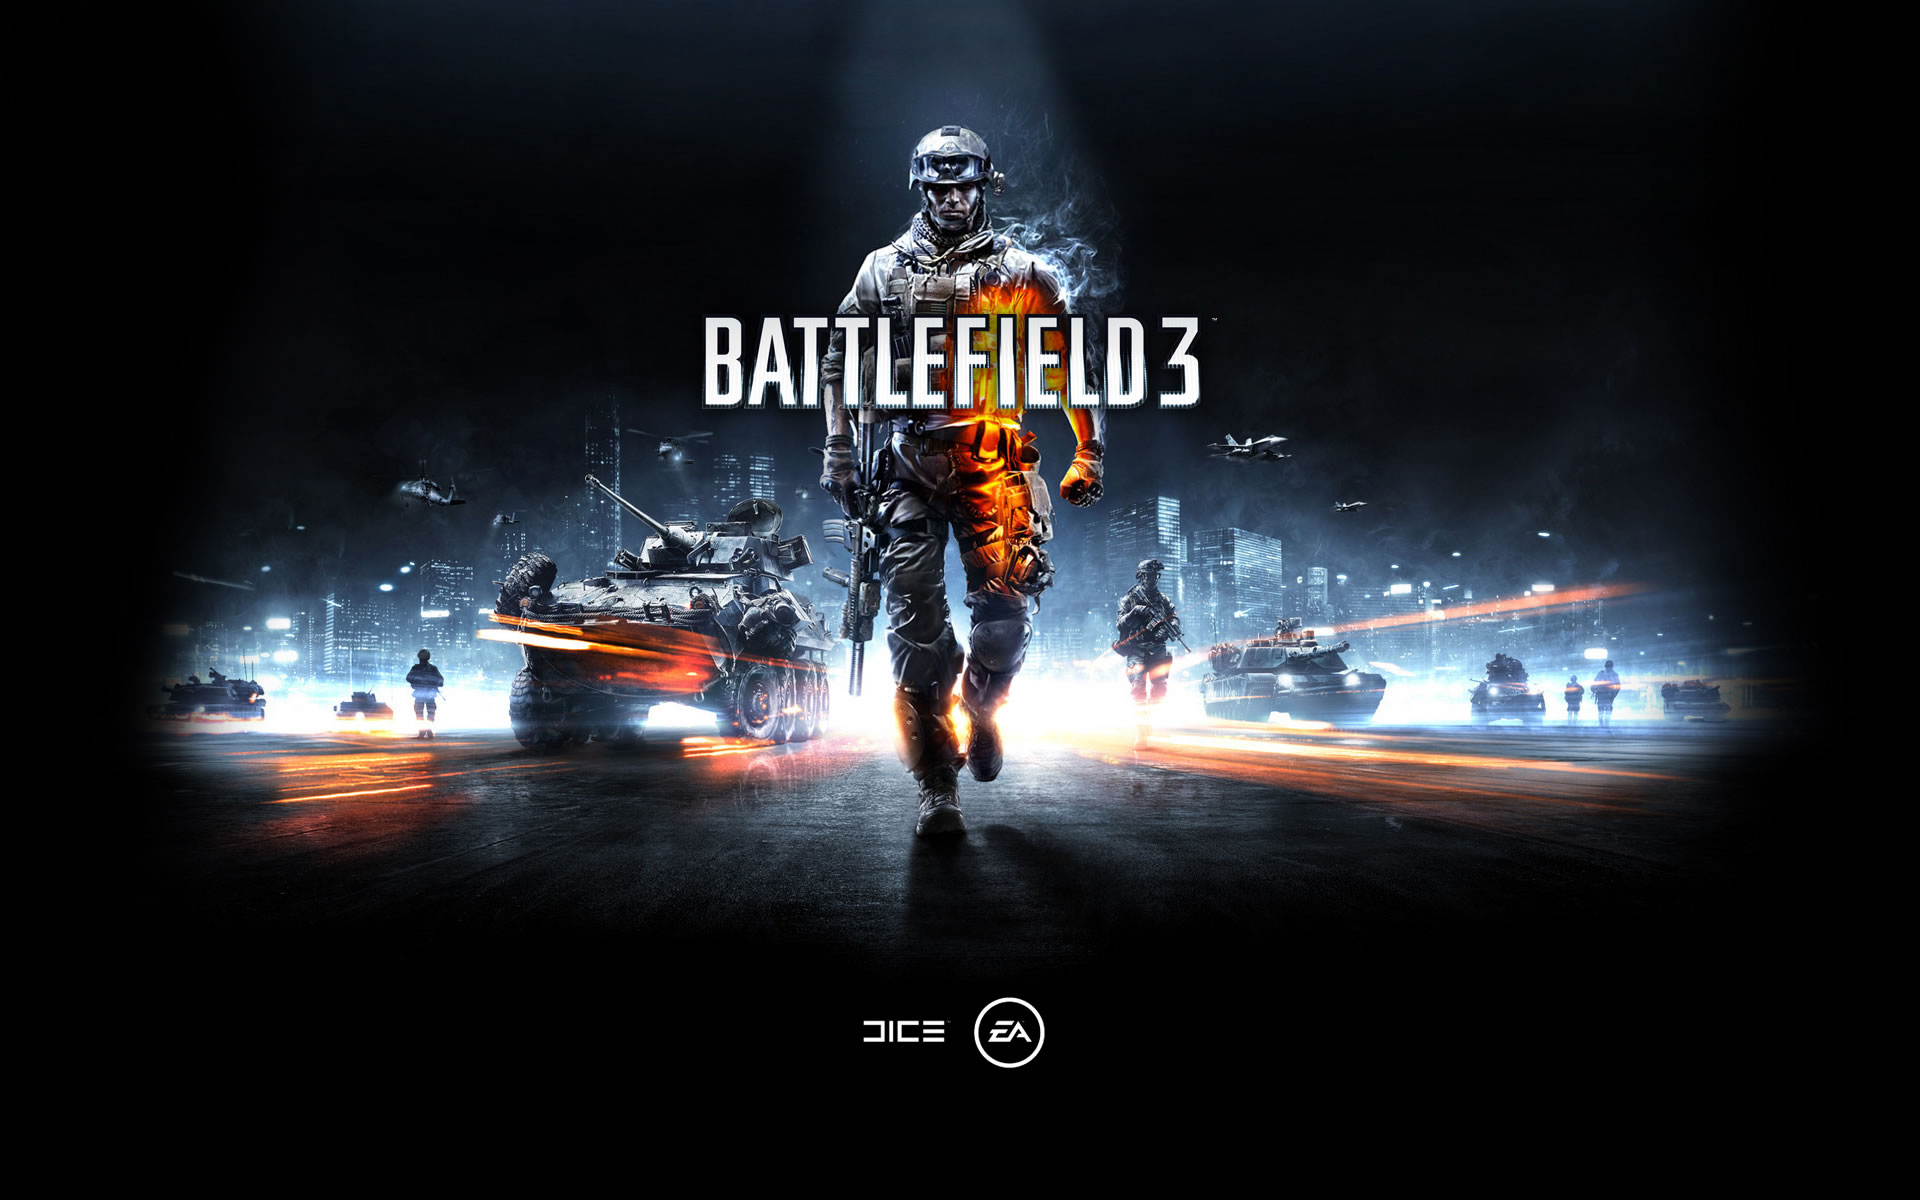 New Battlefield 3 HD Wallpaper Windows 7 Theme 1920x1200